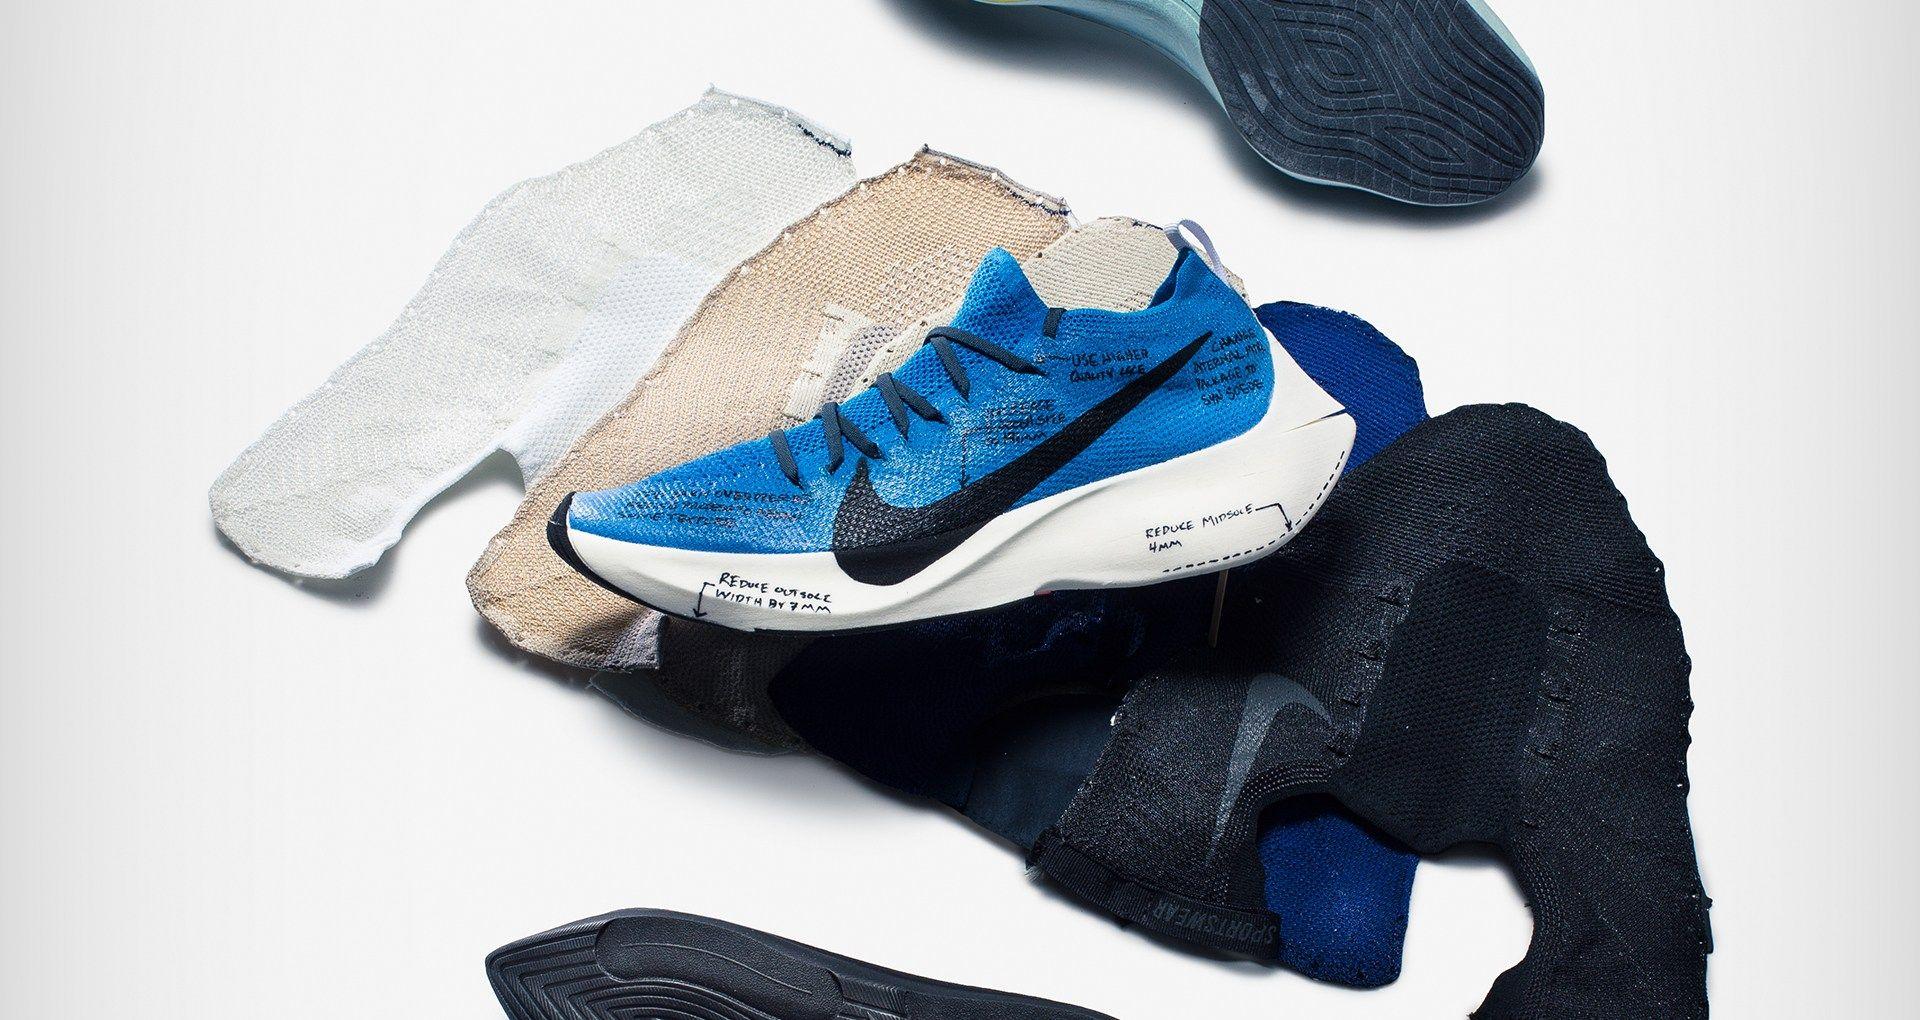 80f5d7be0db4 Design  Nike React Vapor Street Flyknit - EUKicks.com Sneaker Magazine